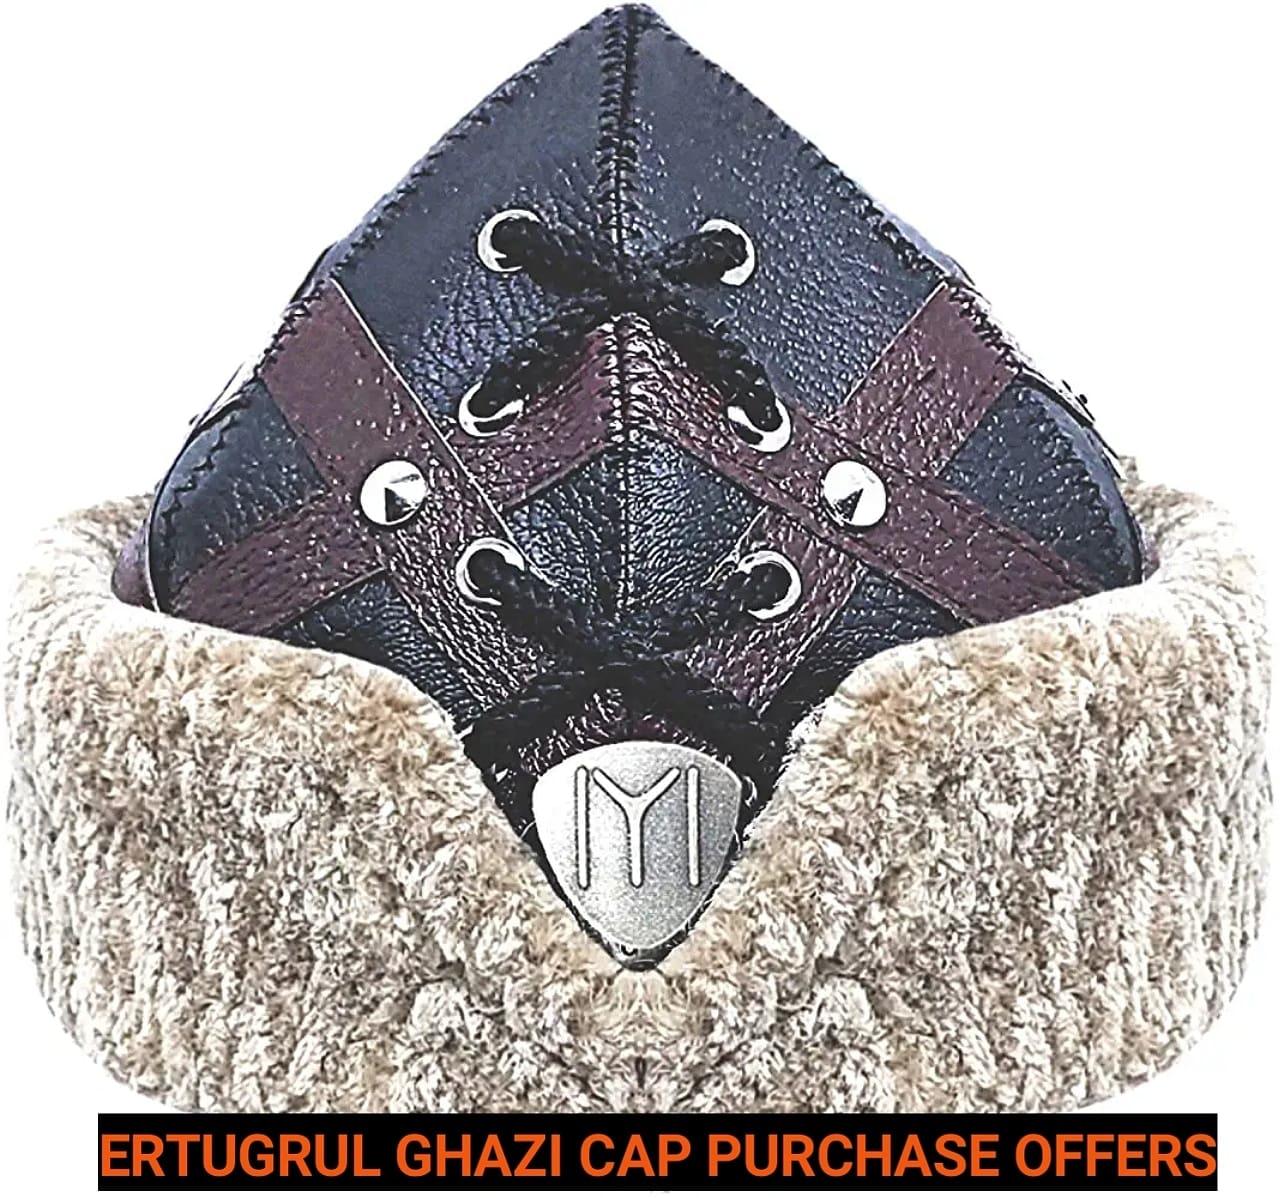 ERTUGRUL GHAZI CAP OFFERS ORDER NOW